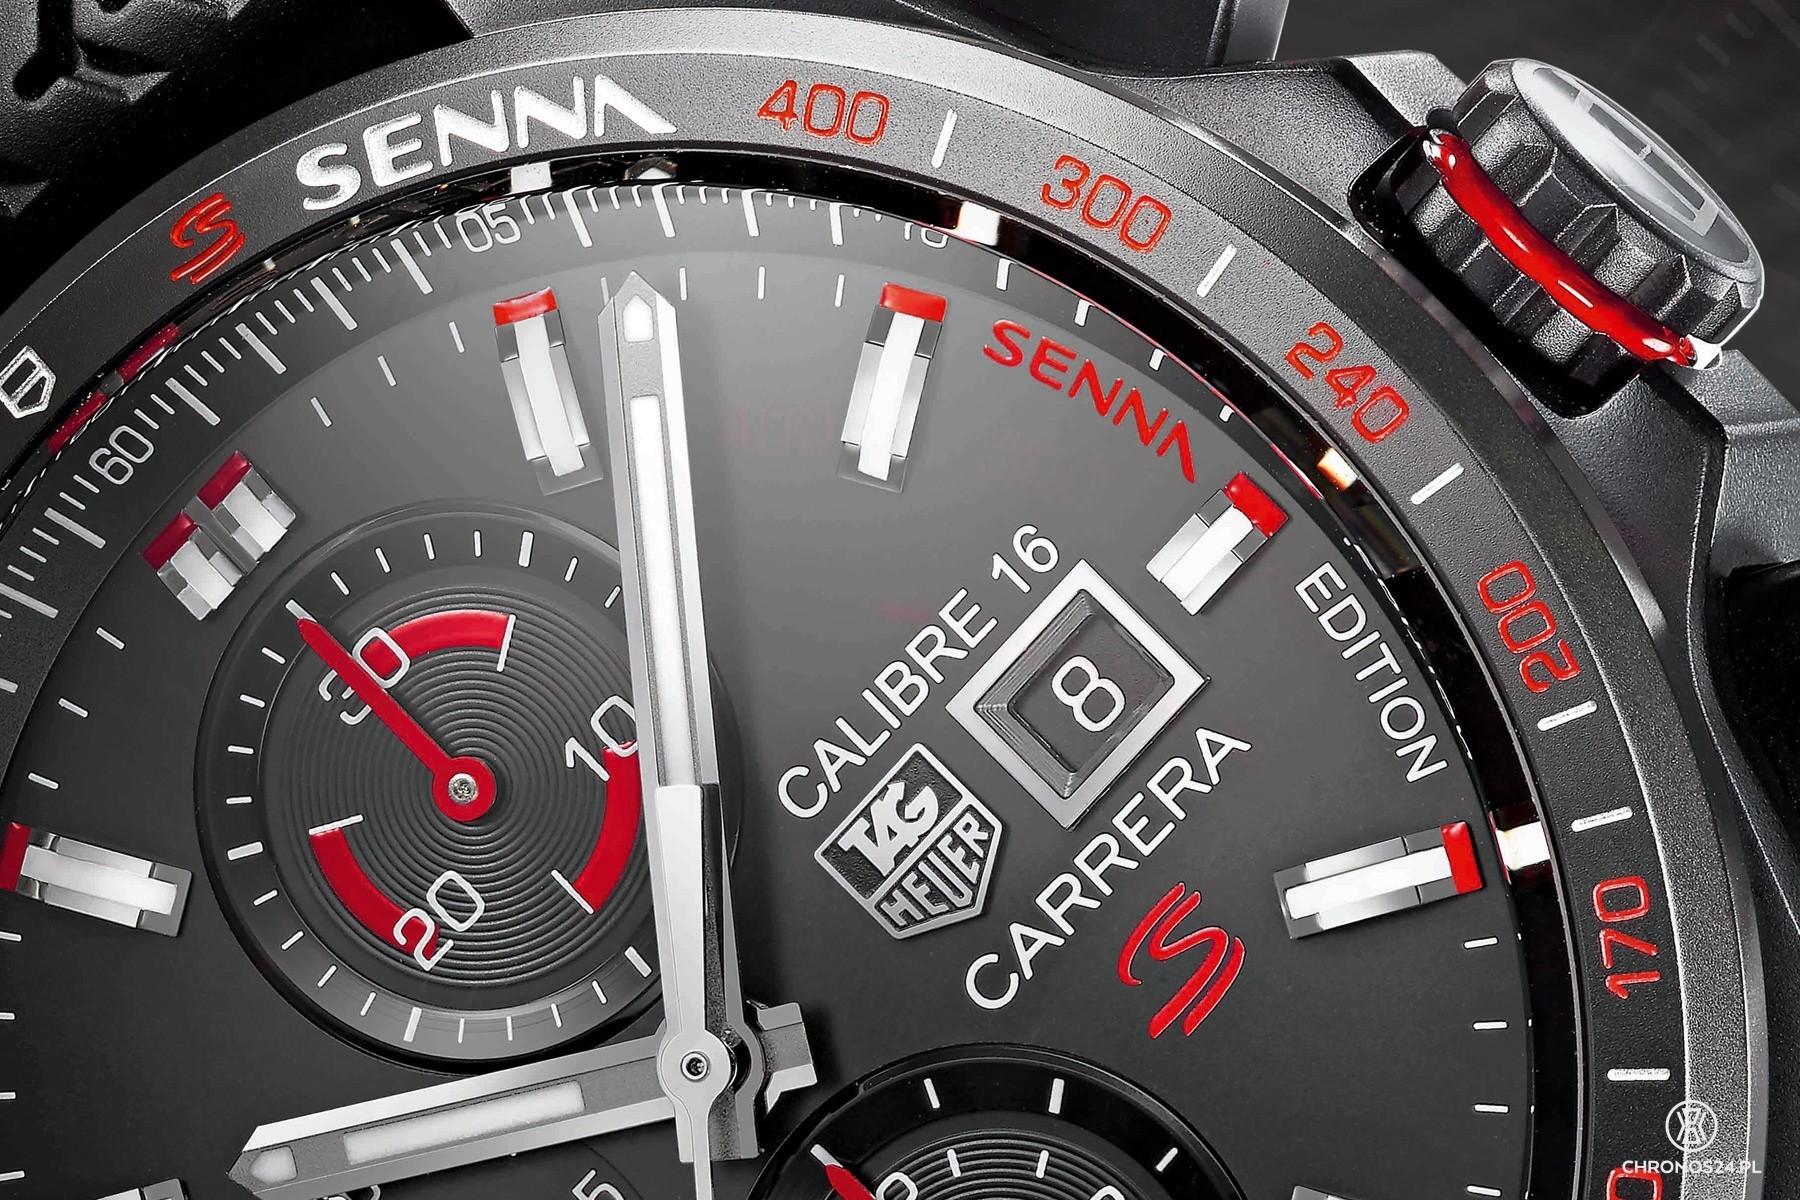 614d951c86467 TAG Heuer Carrera Calibre 16 Senna Edition - WatchMarkaz.pk ...